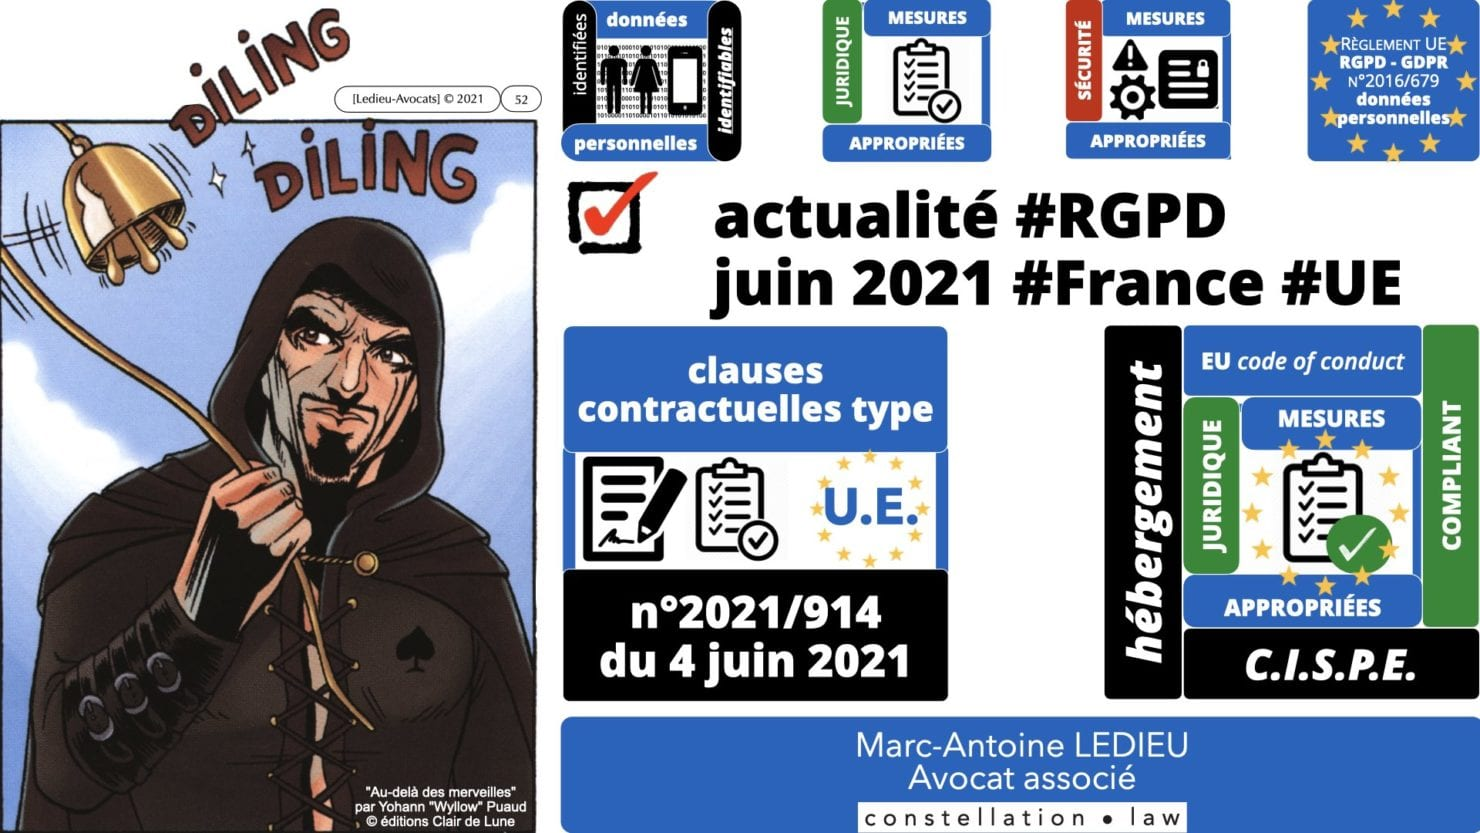 RGPD e-Privacy principes actualité jurisprudence ©Ledieu-Avocats 25-06-2021.052